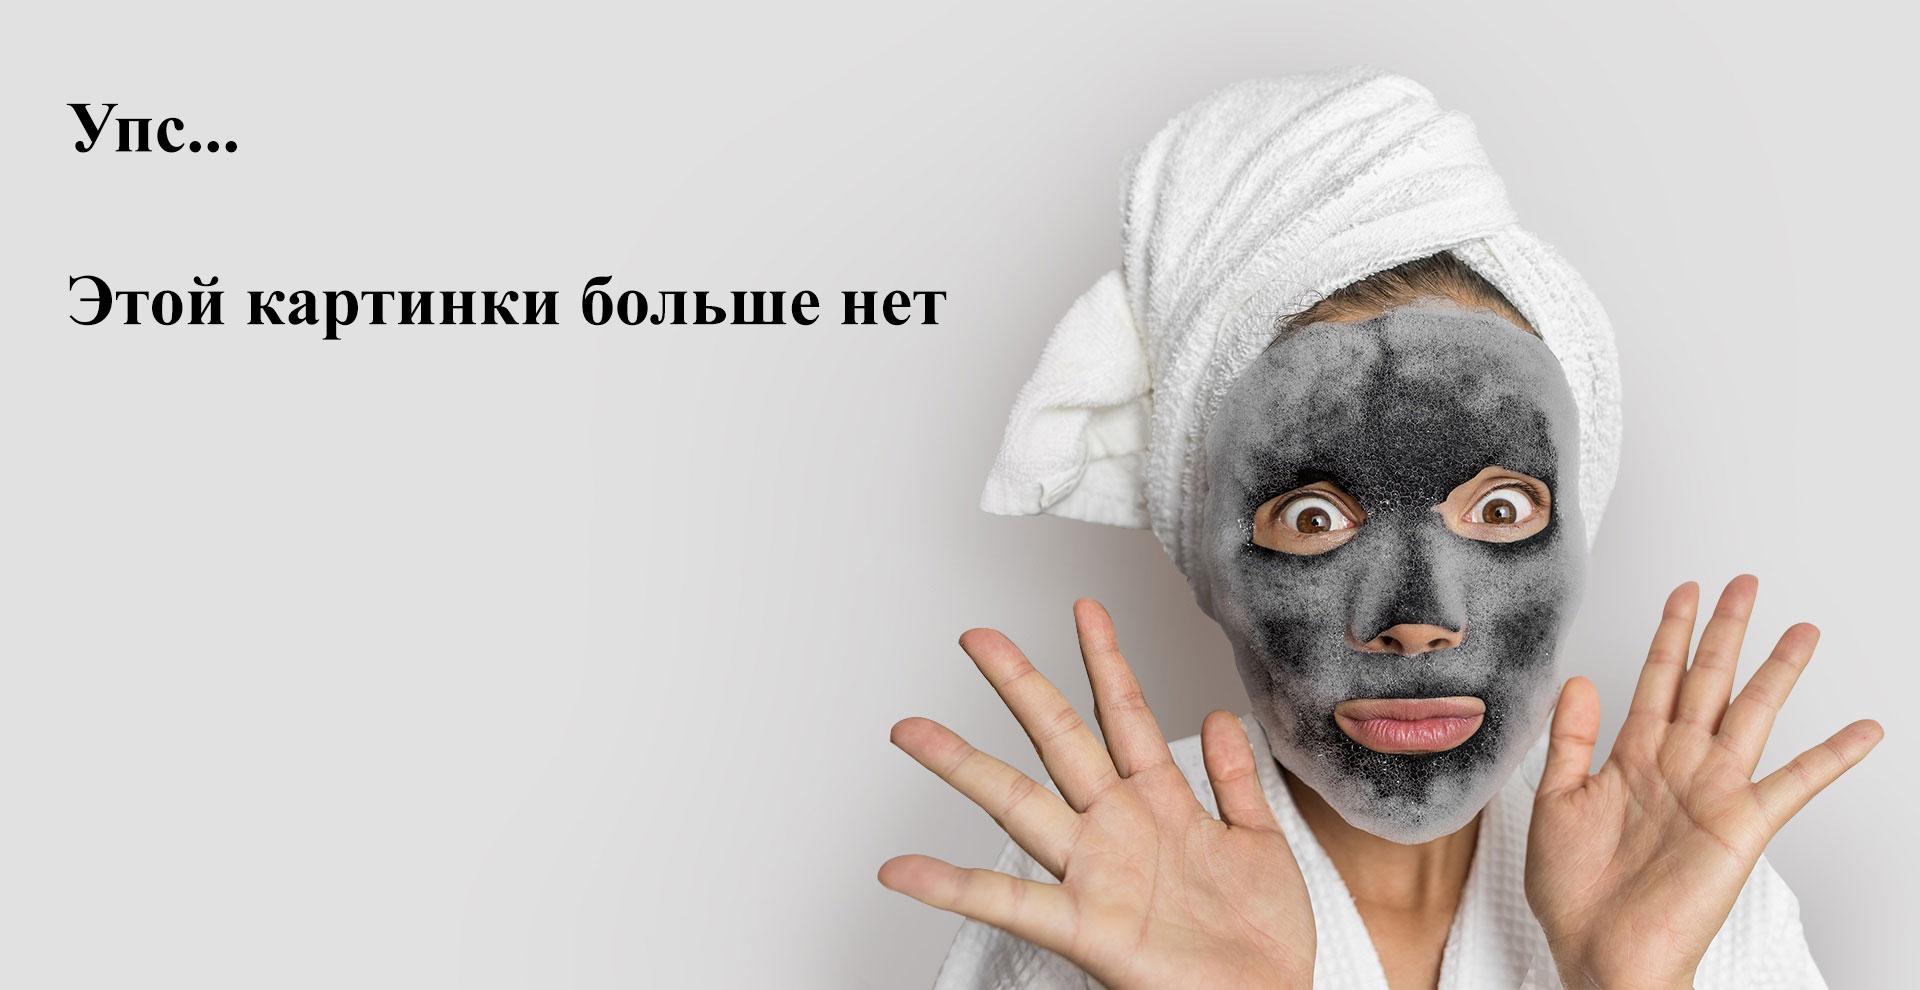 Patrisa Nail, Гель-лак «Стиль жизни» №435